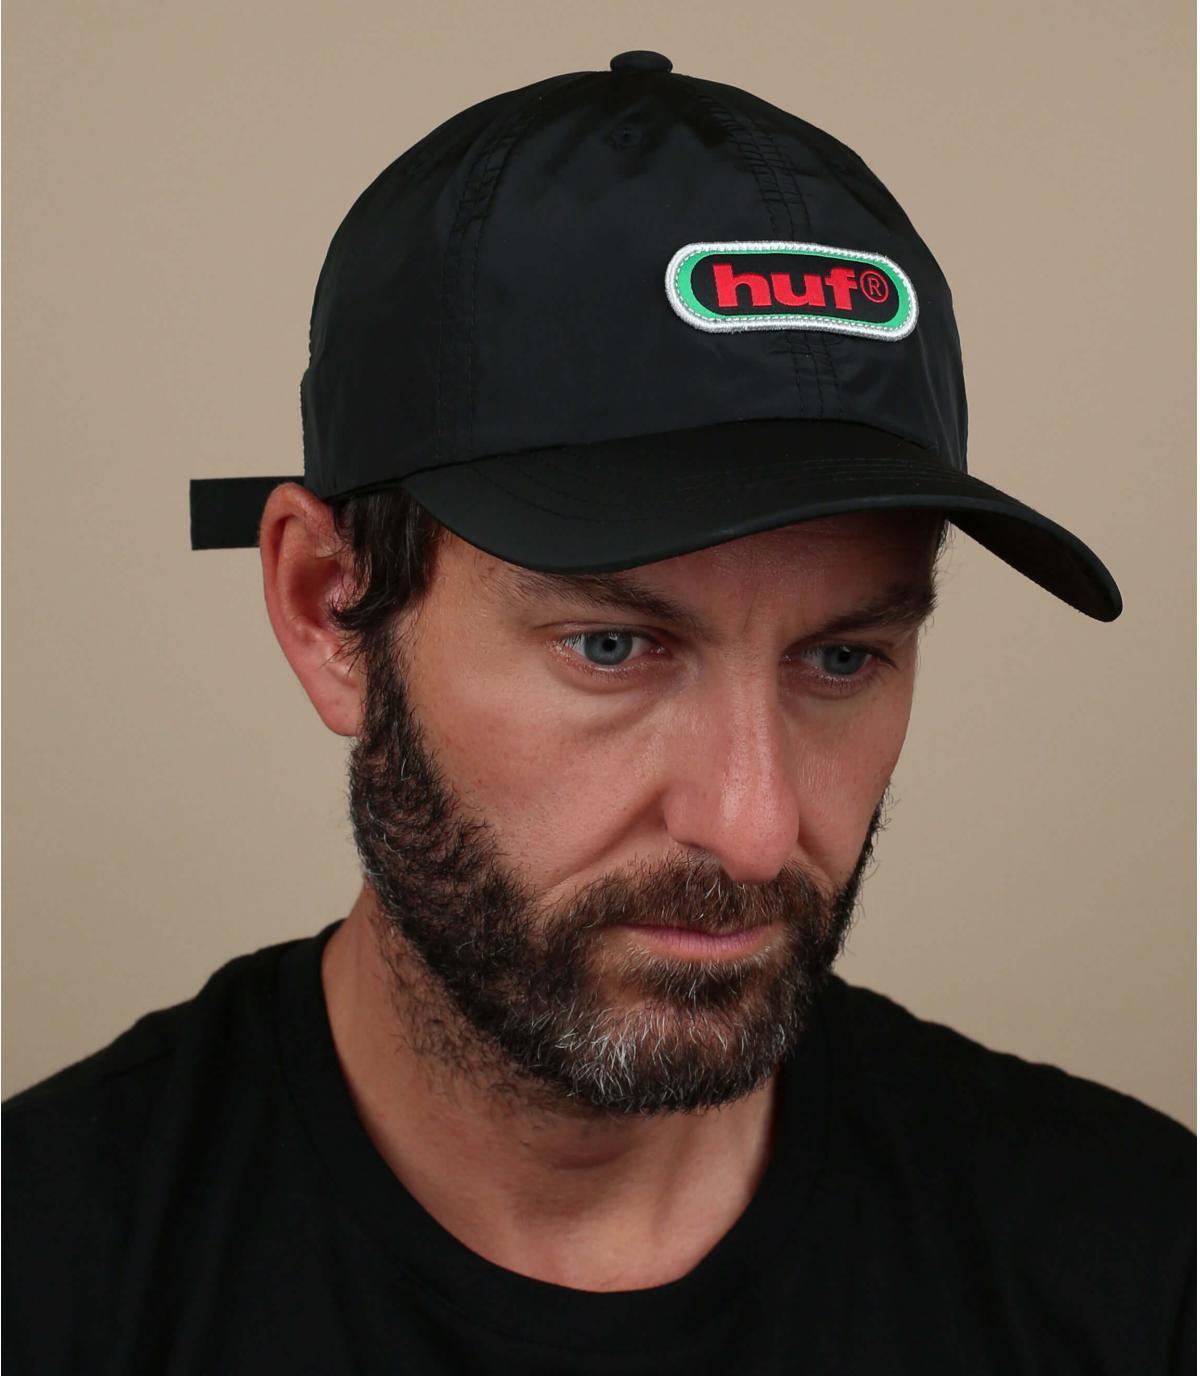 gorra negro Huf vintage